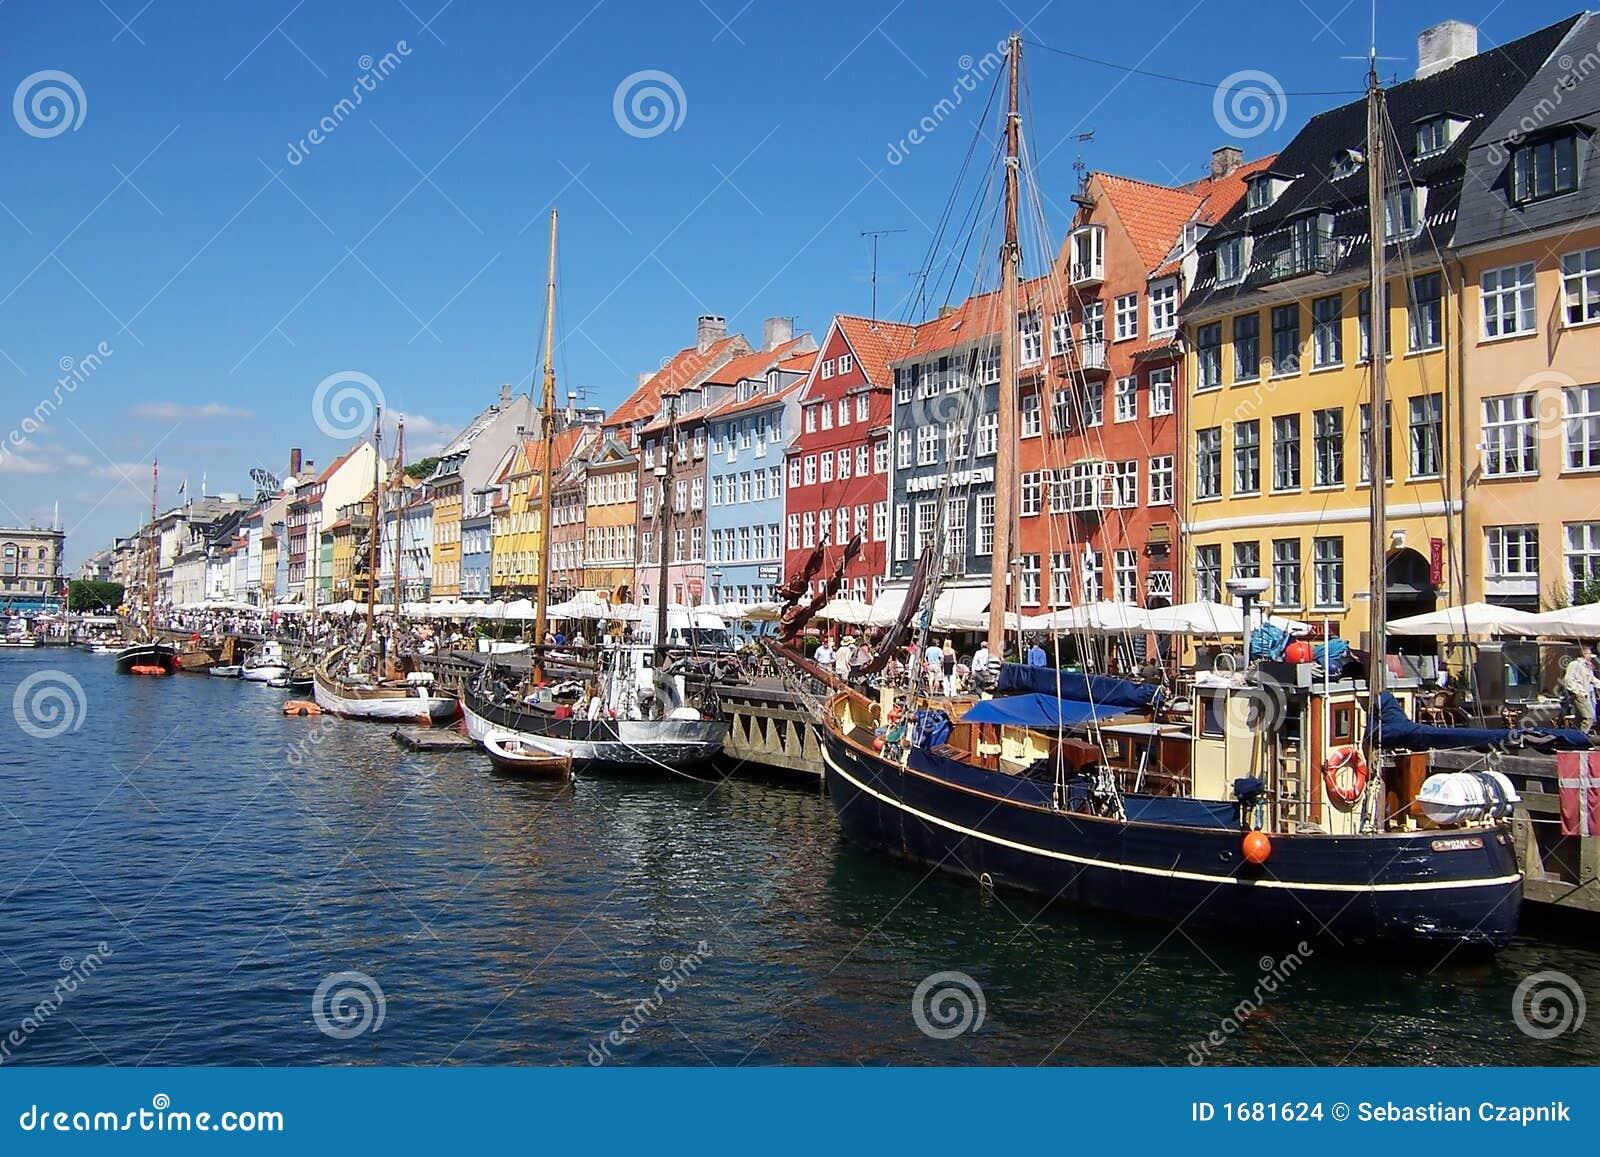 Canale di Copenhaghen, barche.